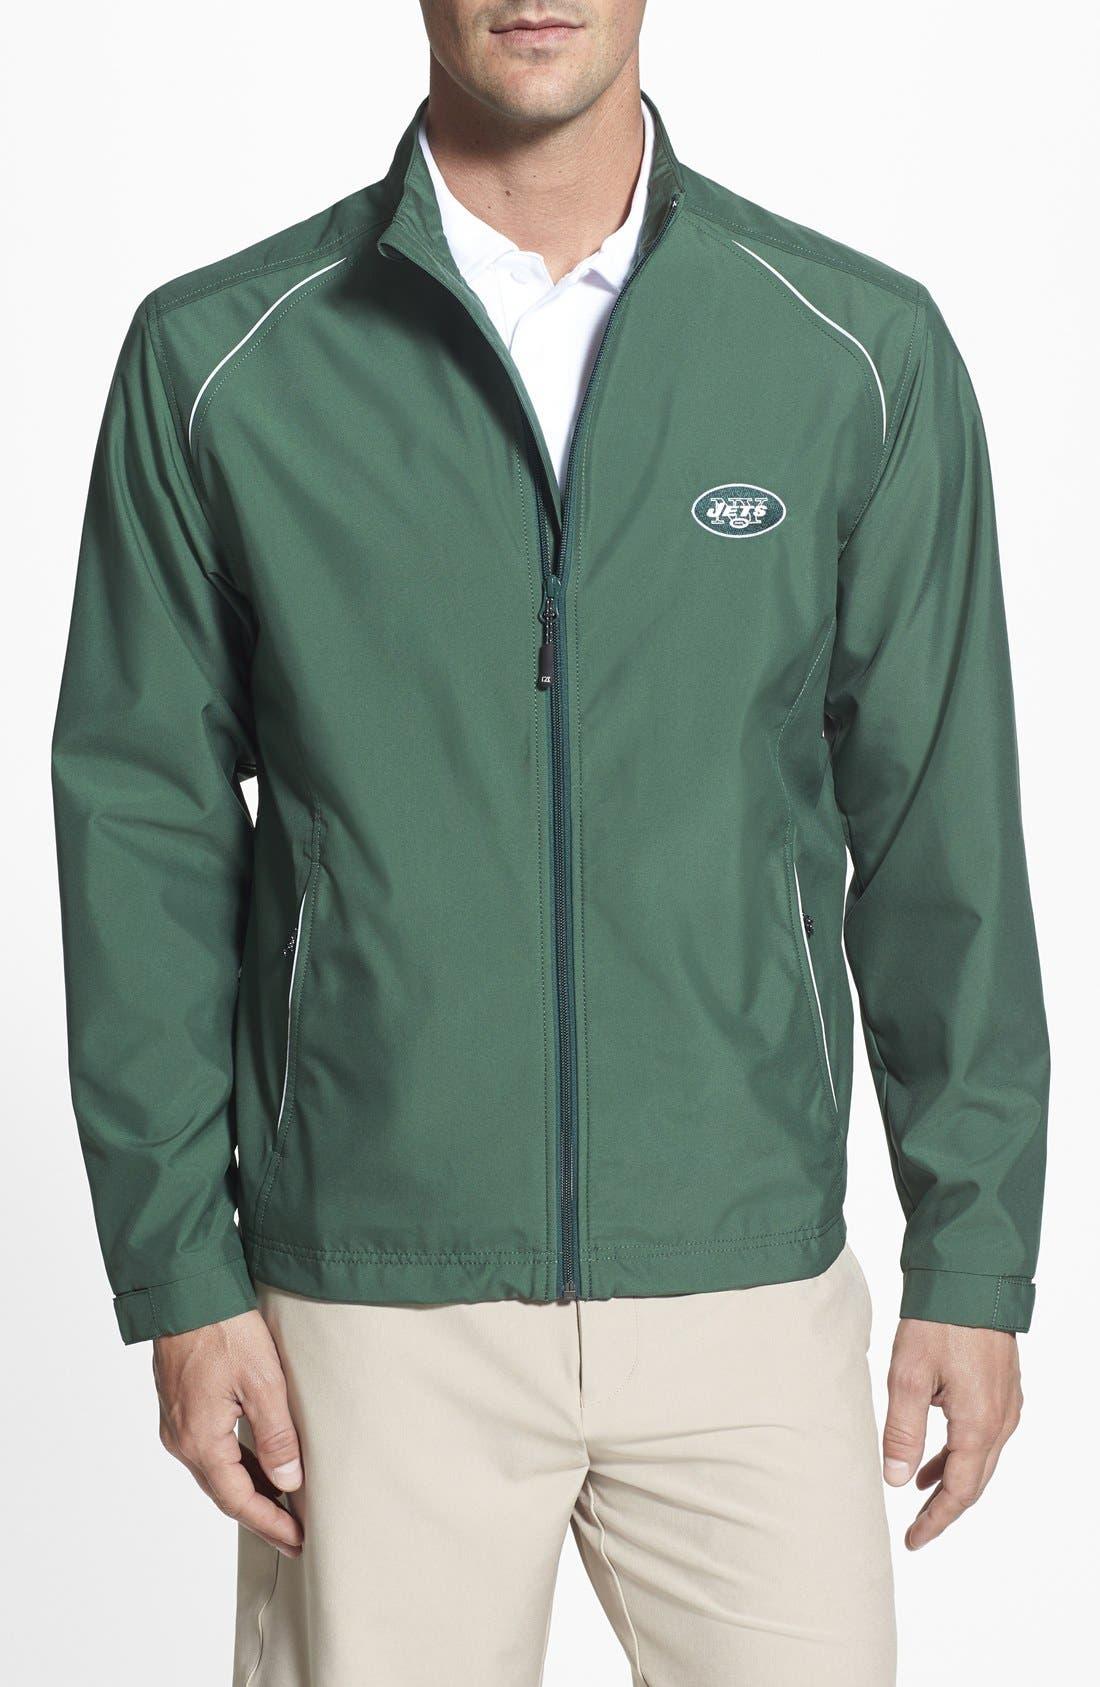 Alternate Image 1 Selected - Cutter & Buck New York Jets - Beacon WeatherTec Wind & Water Resistant Jacket